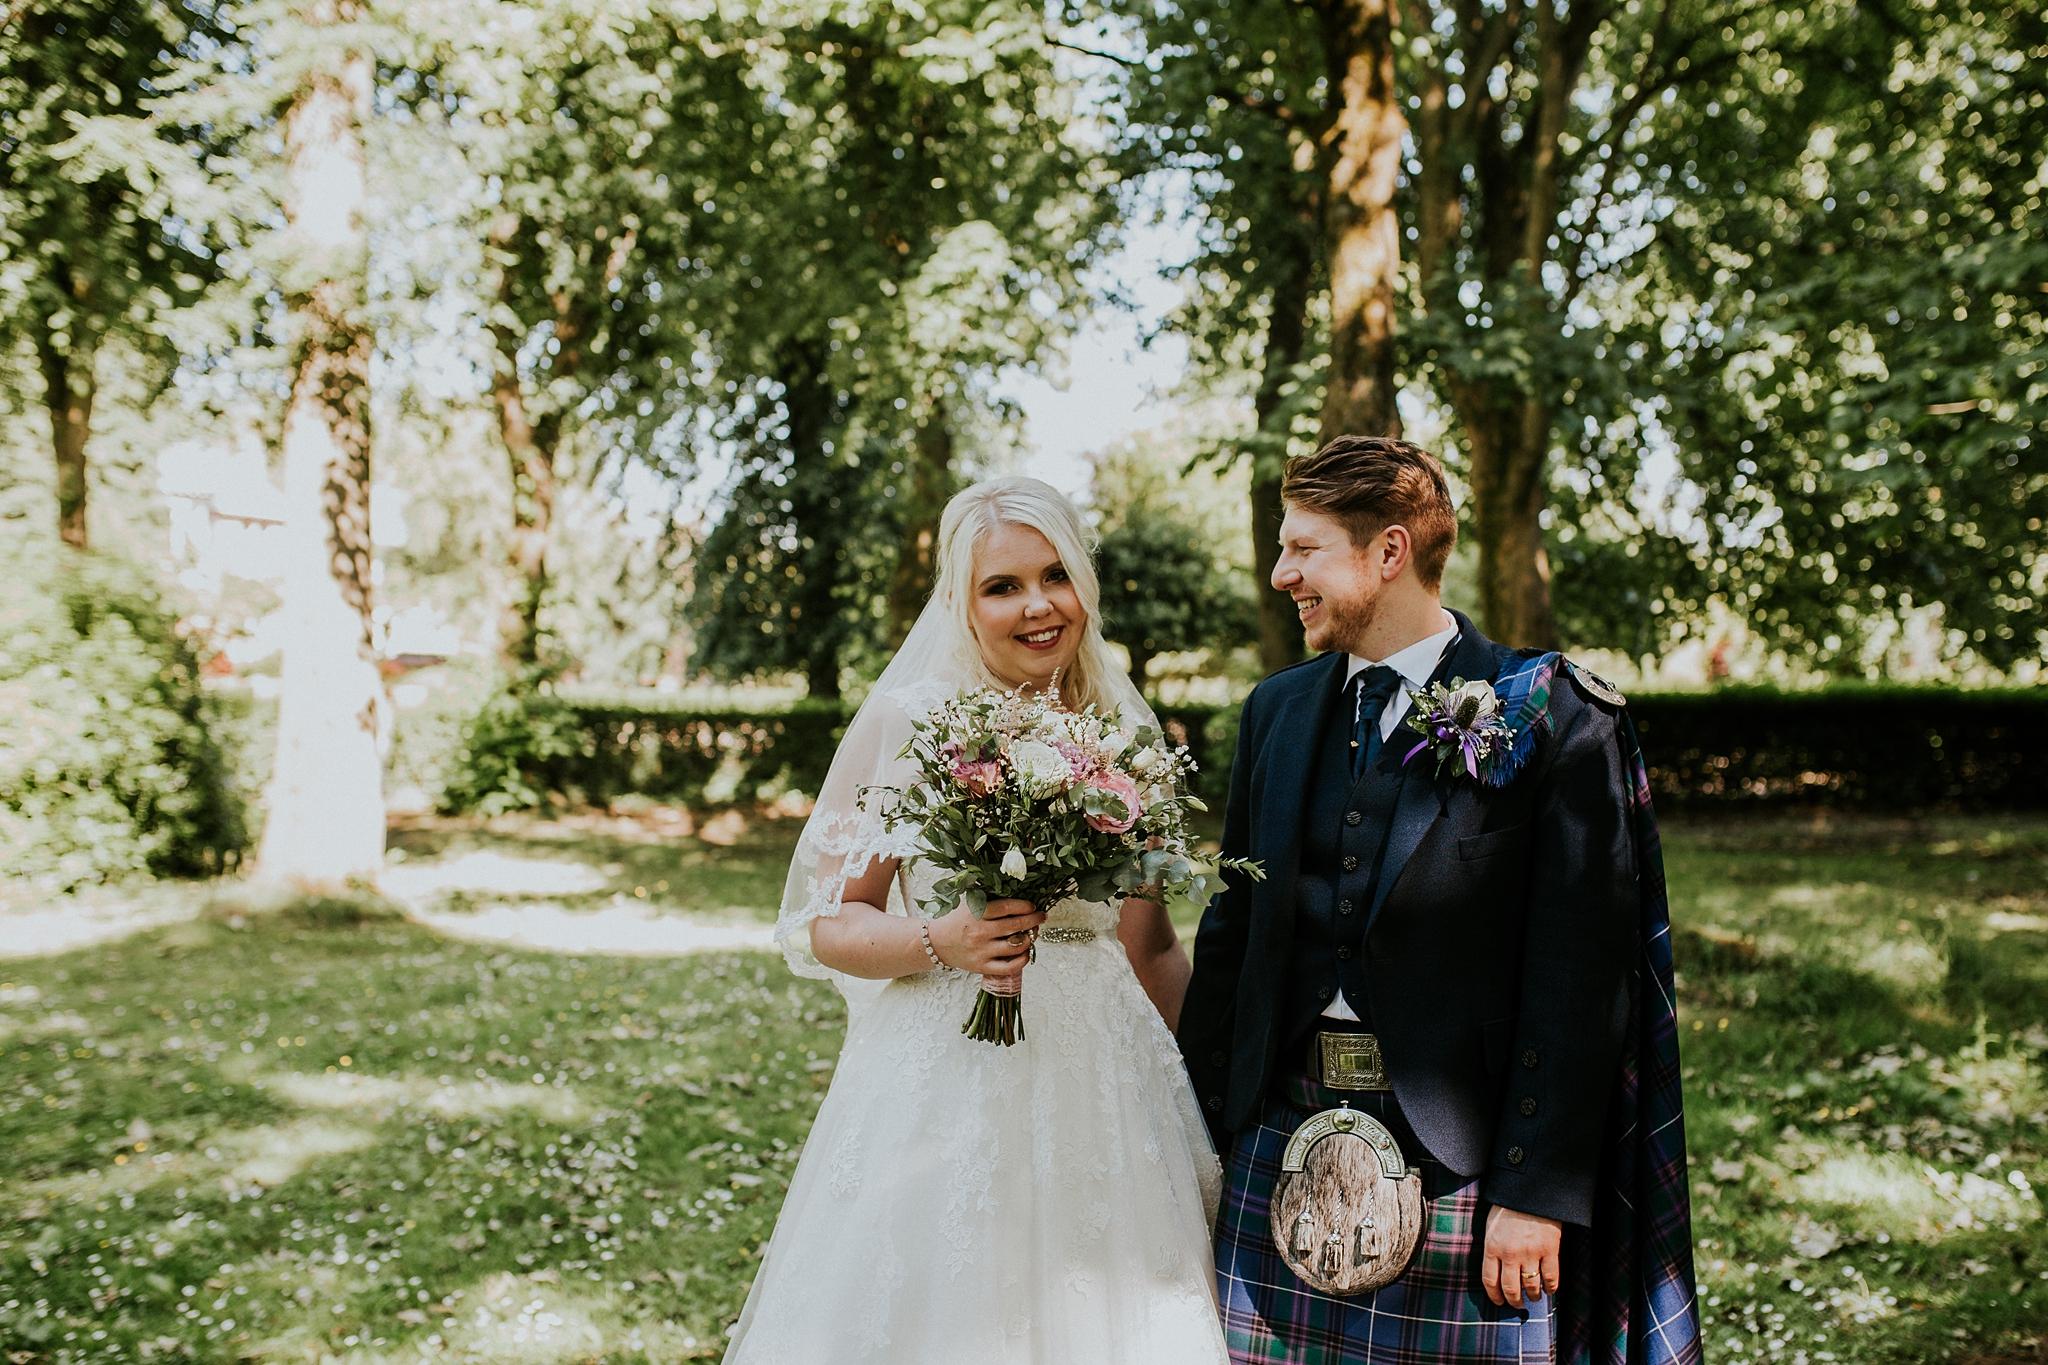 Mark_Alison_Pollockshields_Burgh_Hall_Wedding-25.JPG